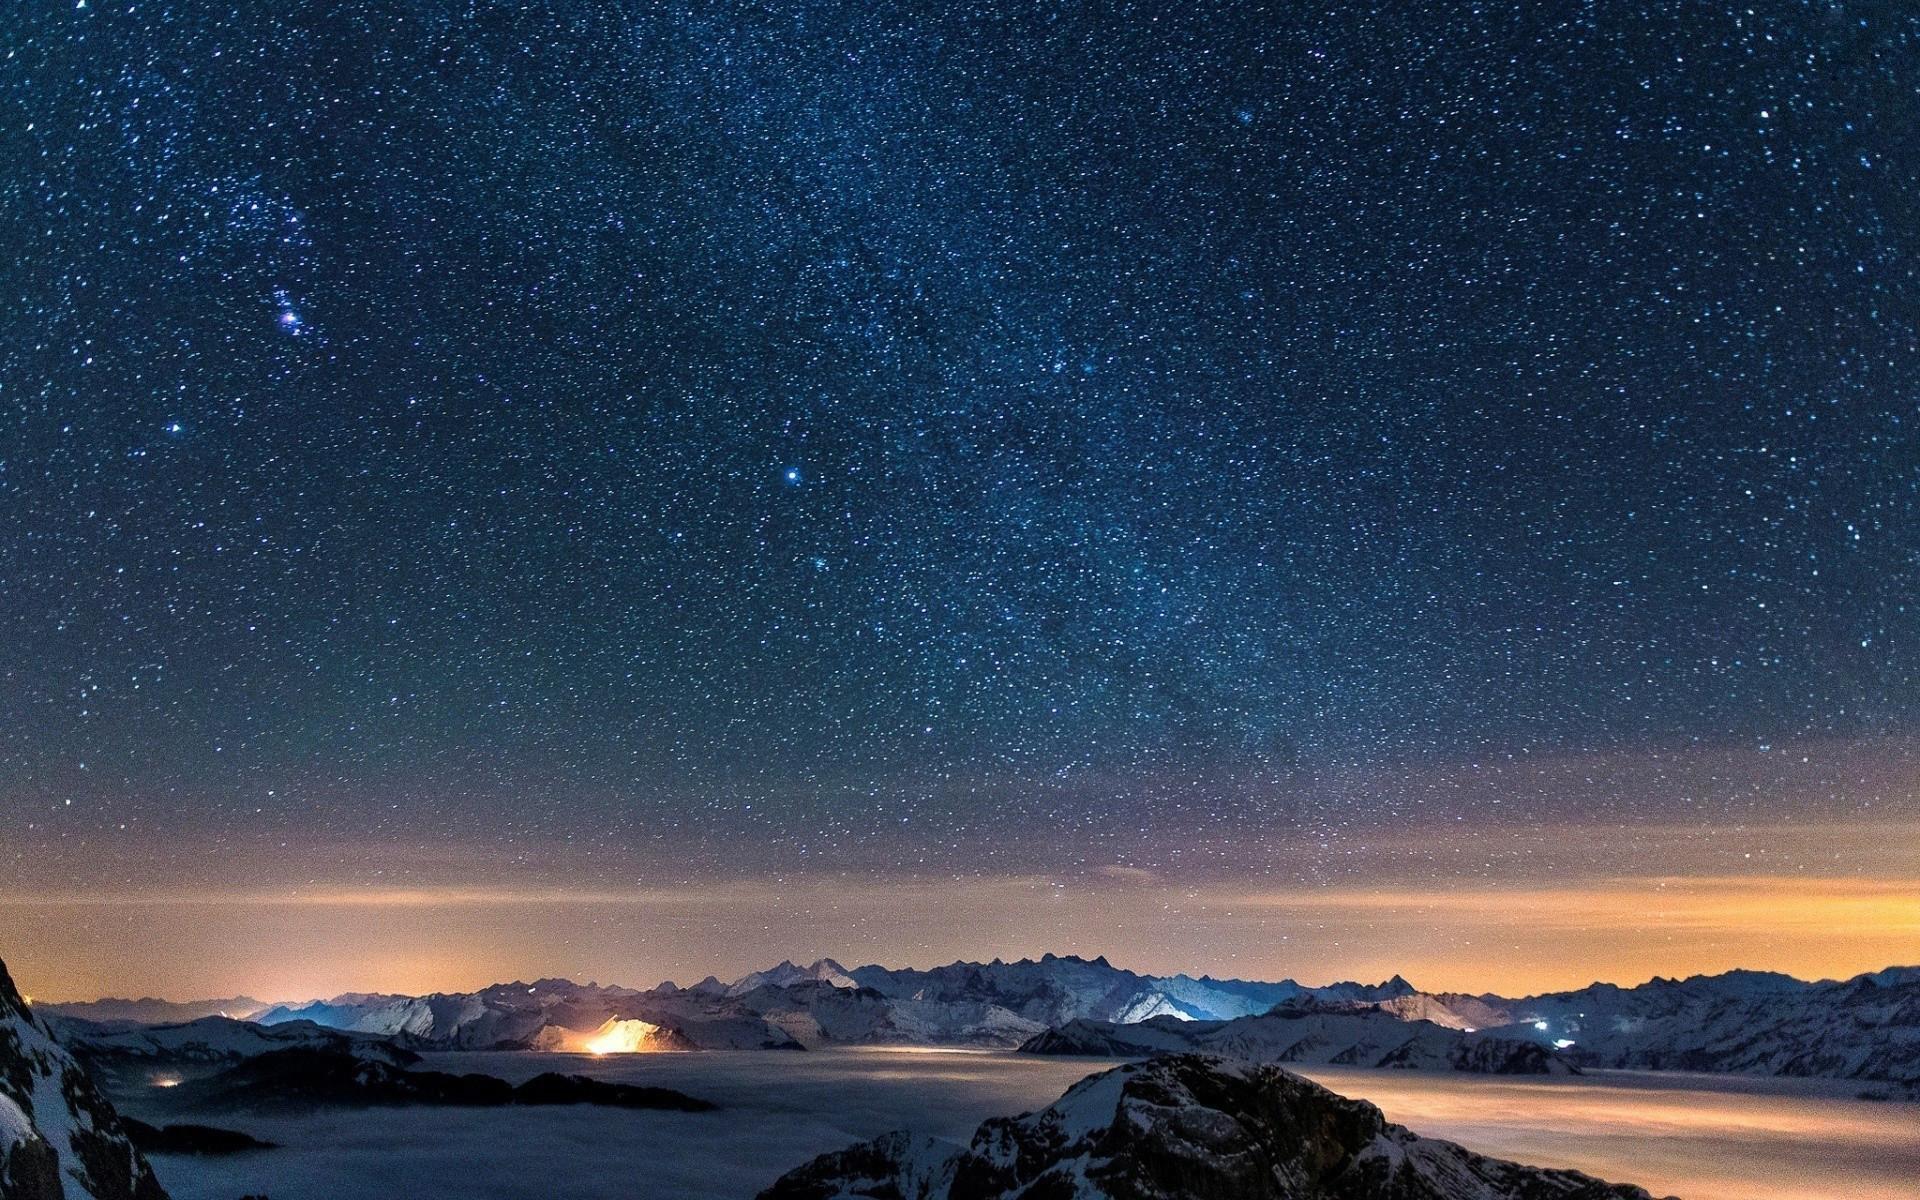 night sky wallpaper 4k | ololoshka | Pinterest | Night, Sky and .